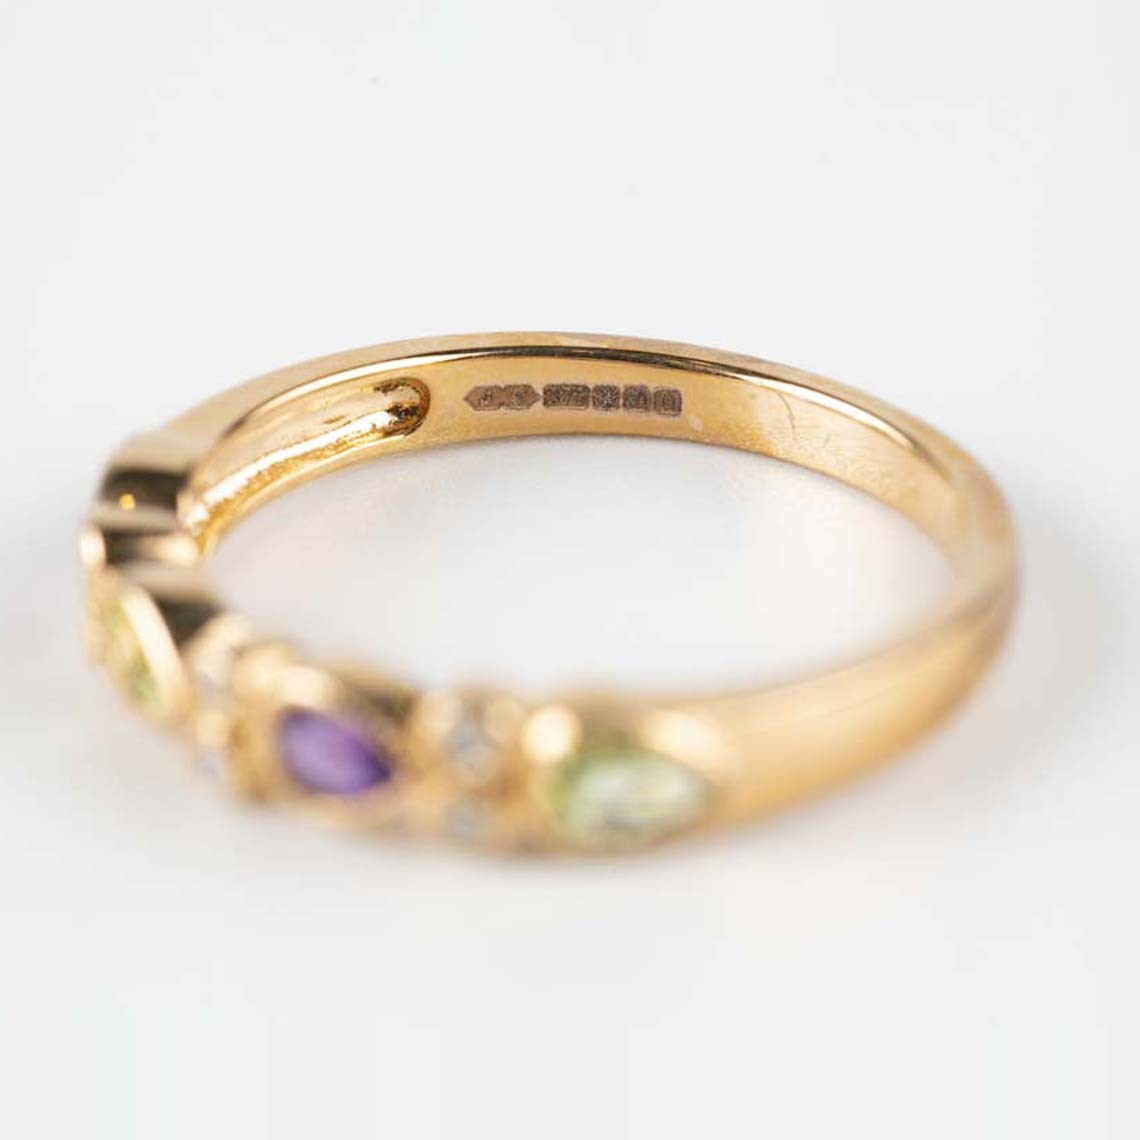 Amethyst, peridot and diamond ring